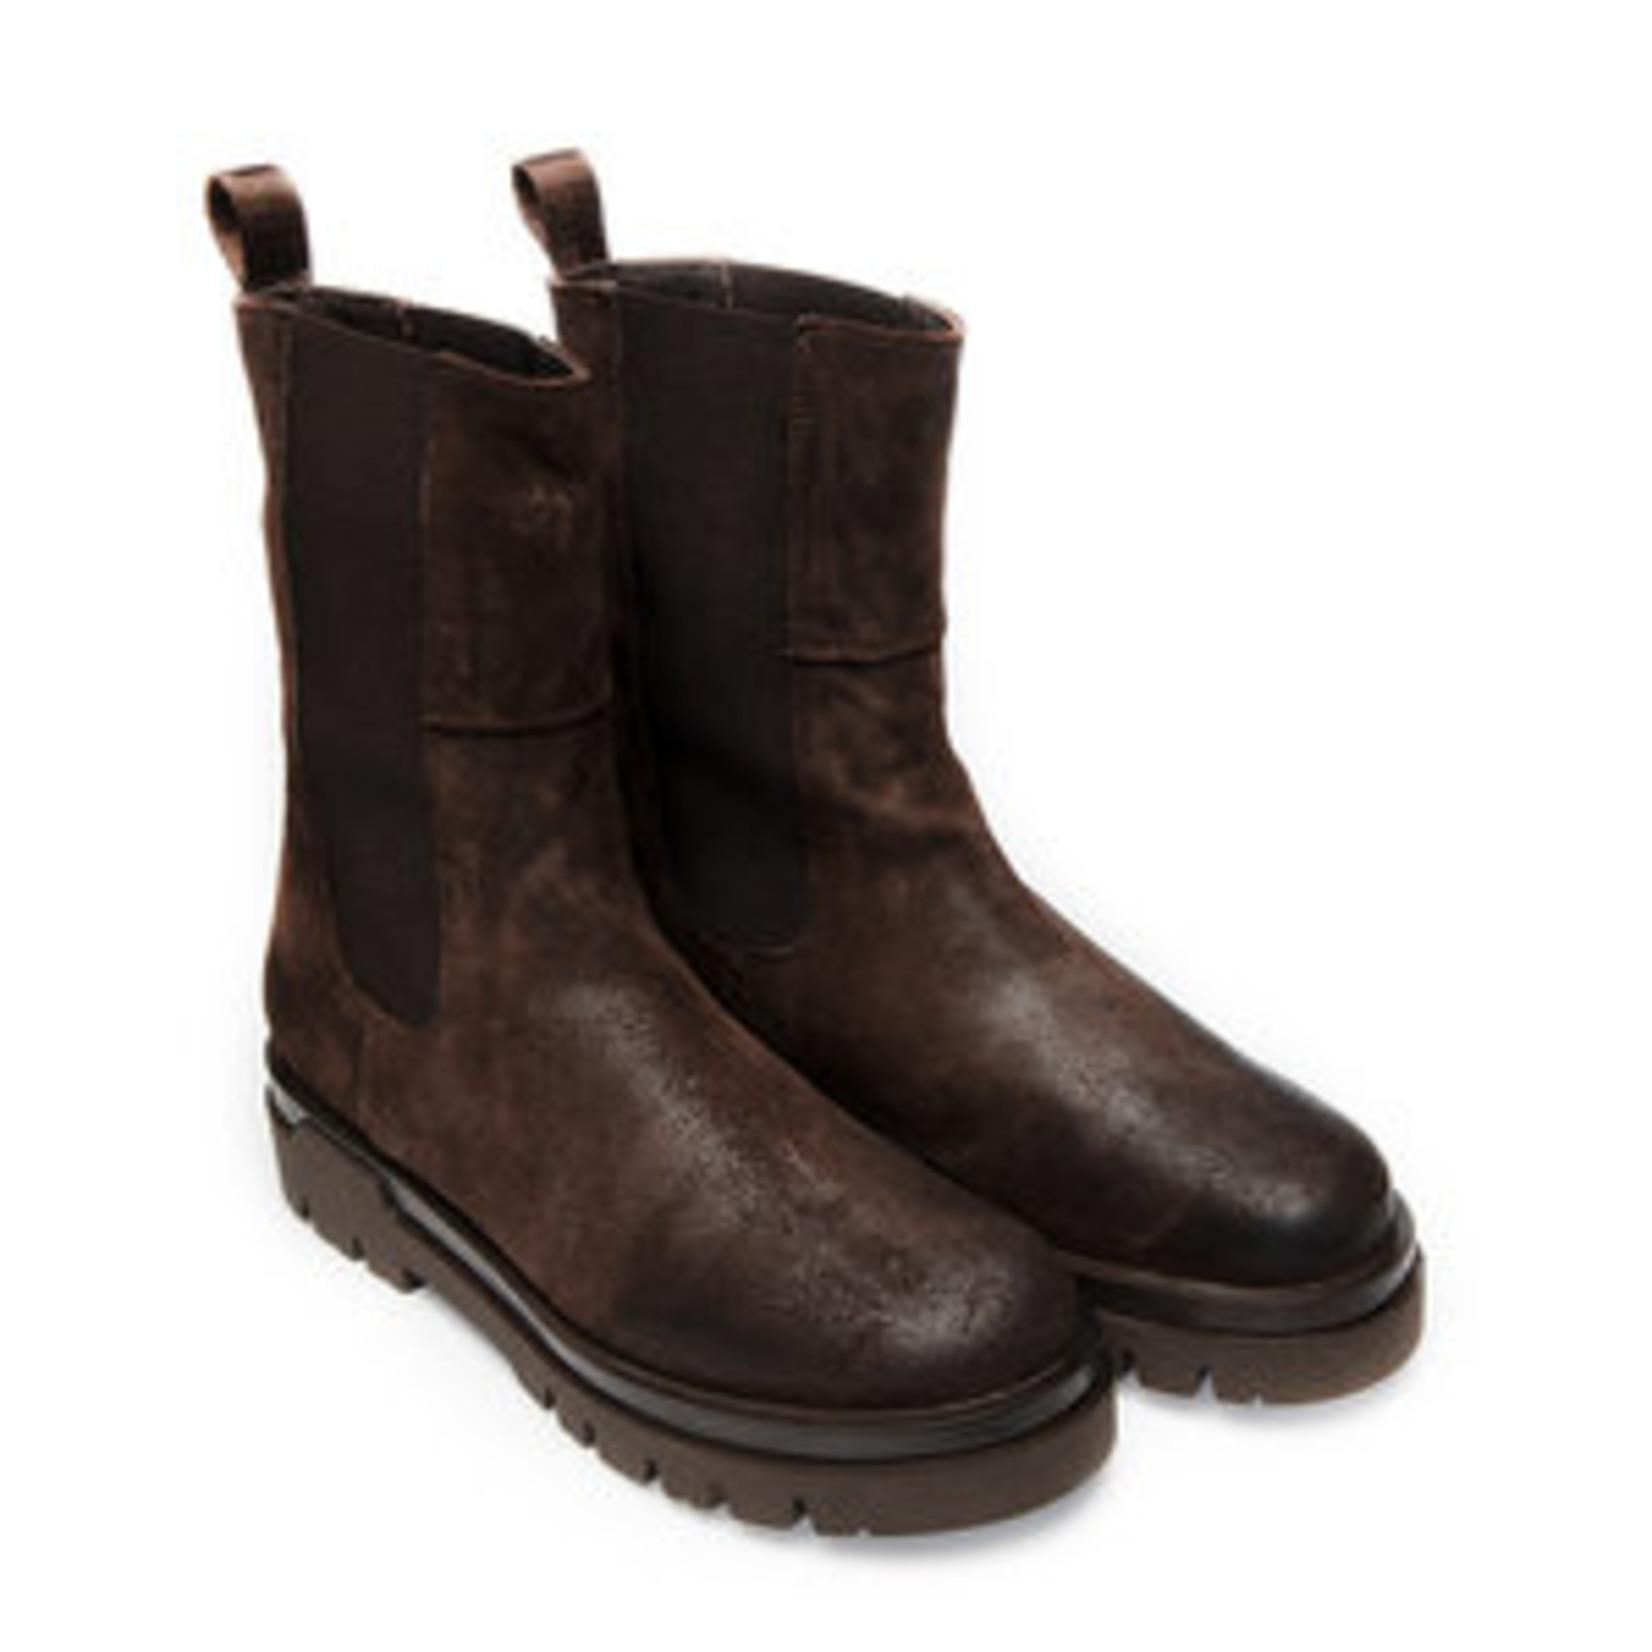 Carmens Chelsea boot halfhoog